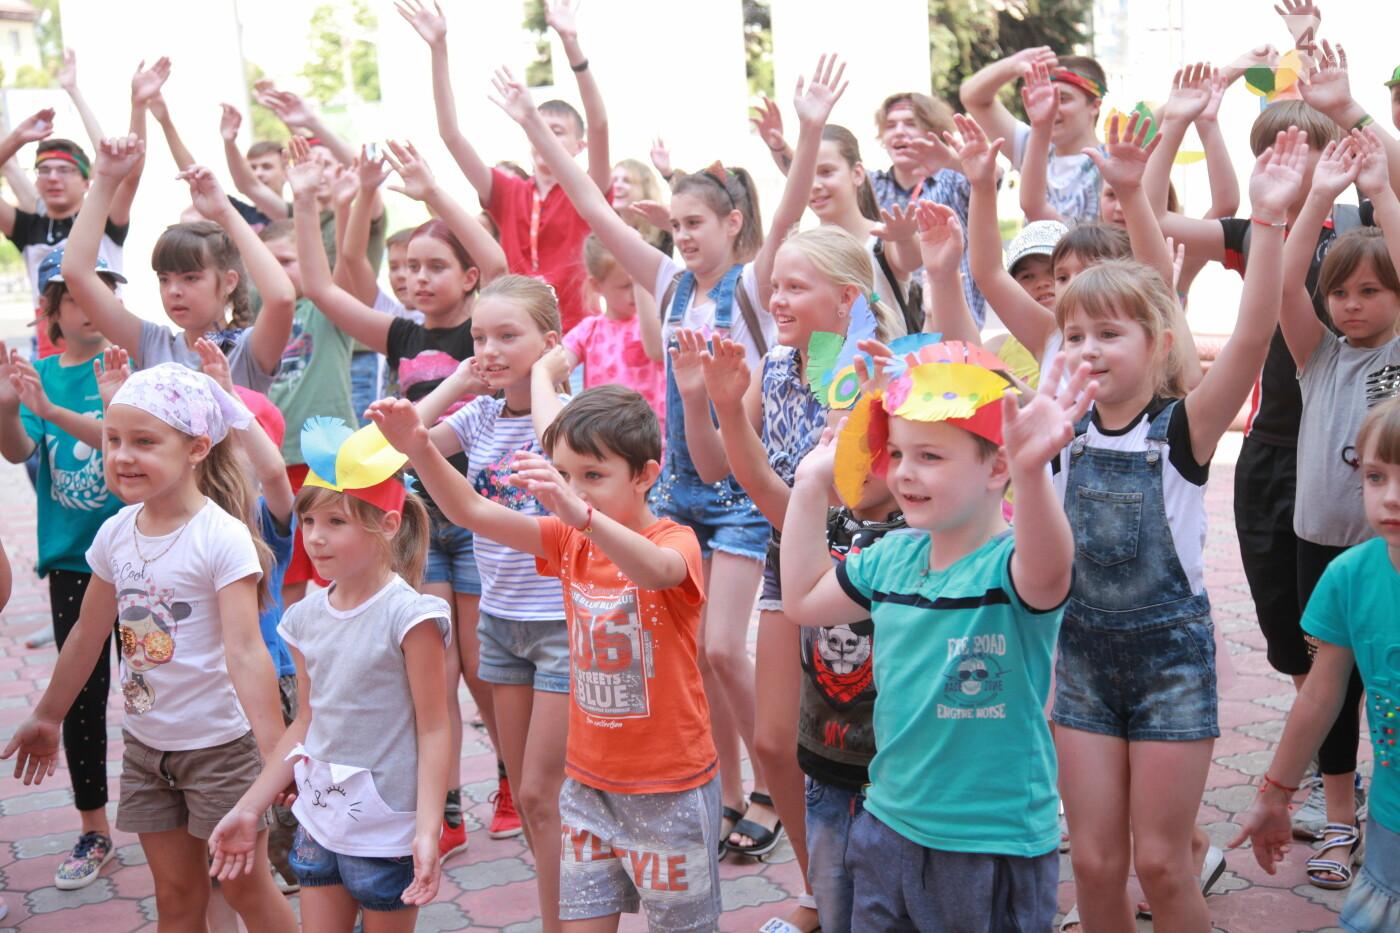 Свыше 600 детей работников предприятия провели летние каникулы с АрселорМиттал Кривой Рог, фото-1